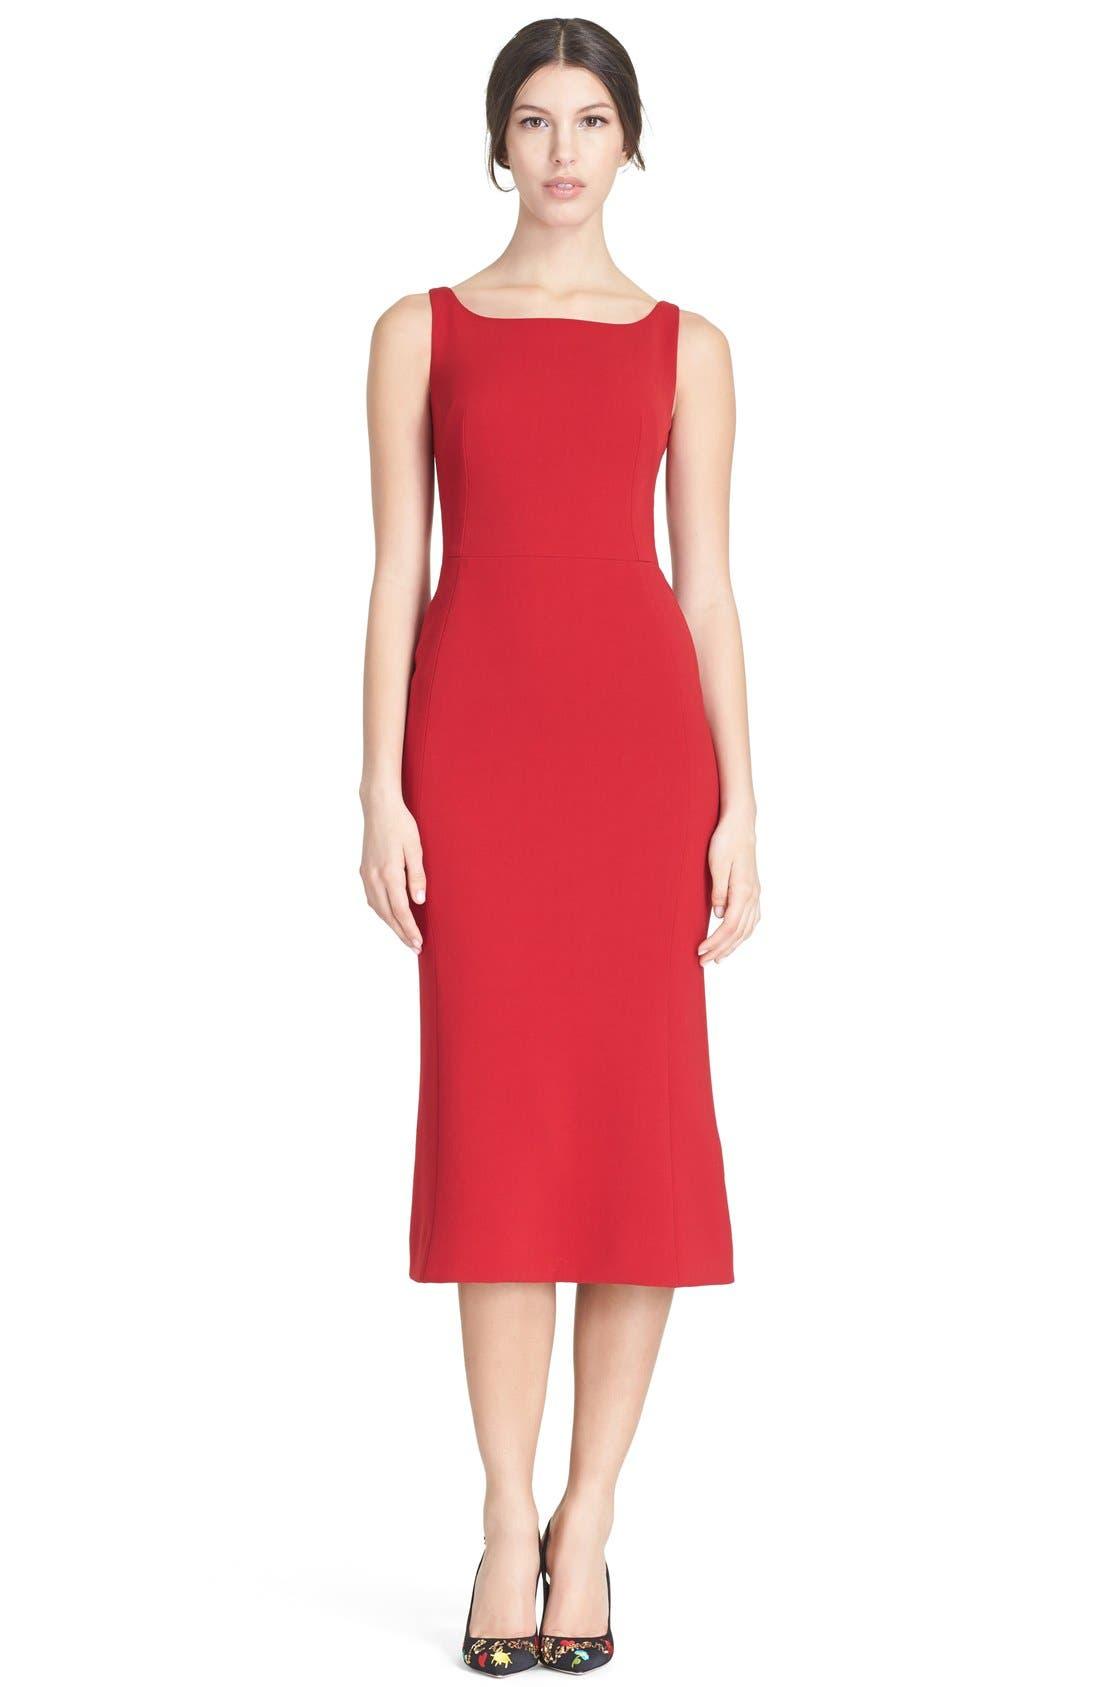 Main Image - Dolce&Gabbana Square Neck Wool Crepe Dress